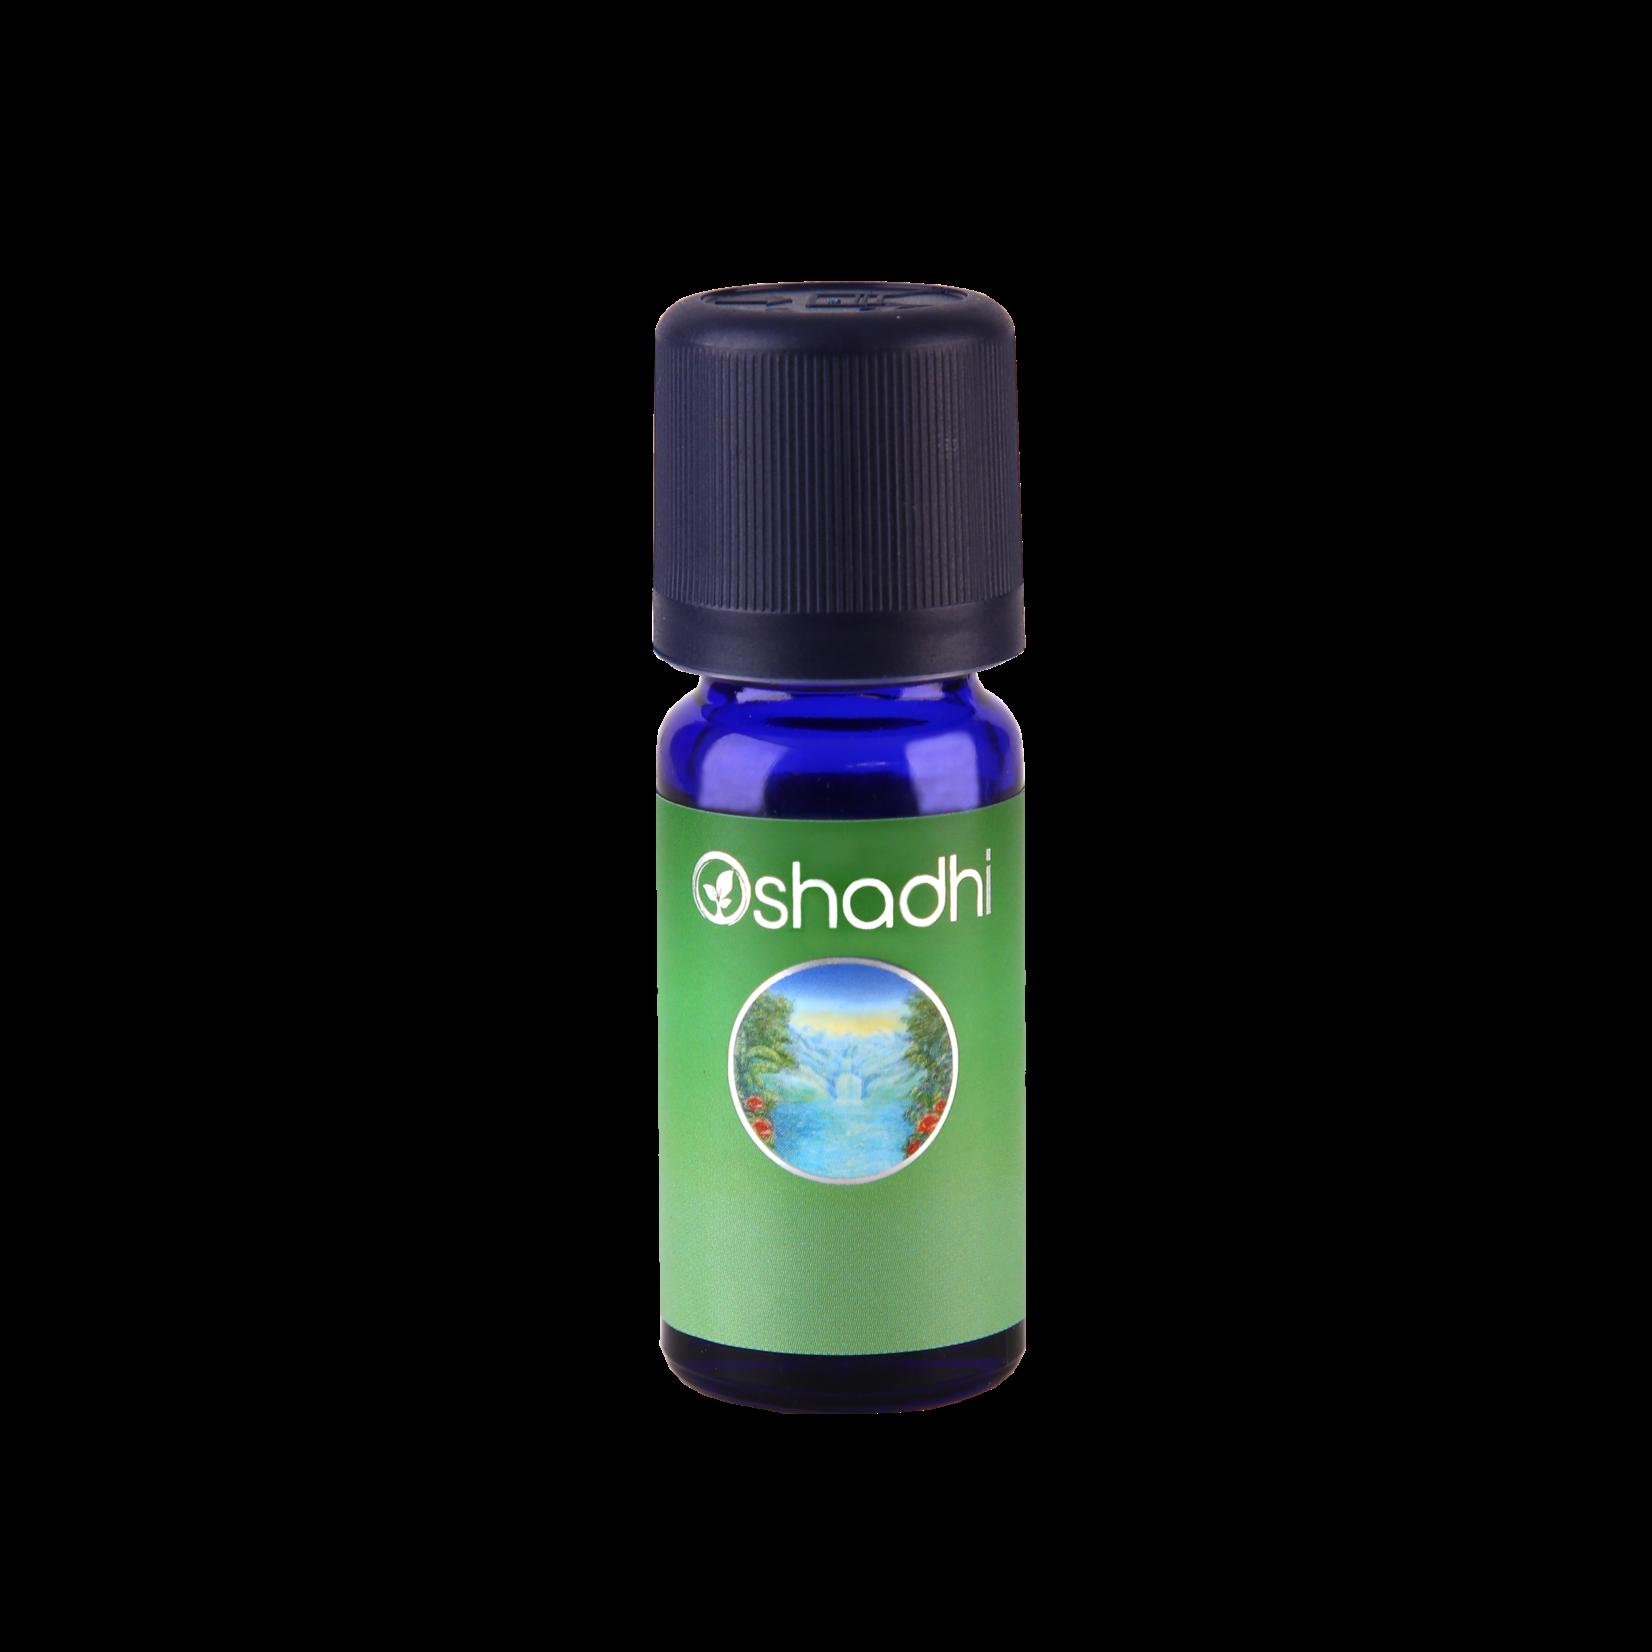 Oshadhi Synergie Tonic Fresh Oshadhi - opkikkertje tijdens donkere dagen